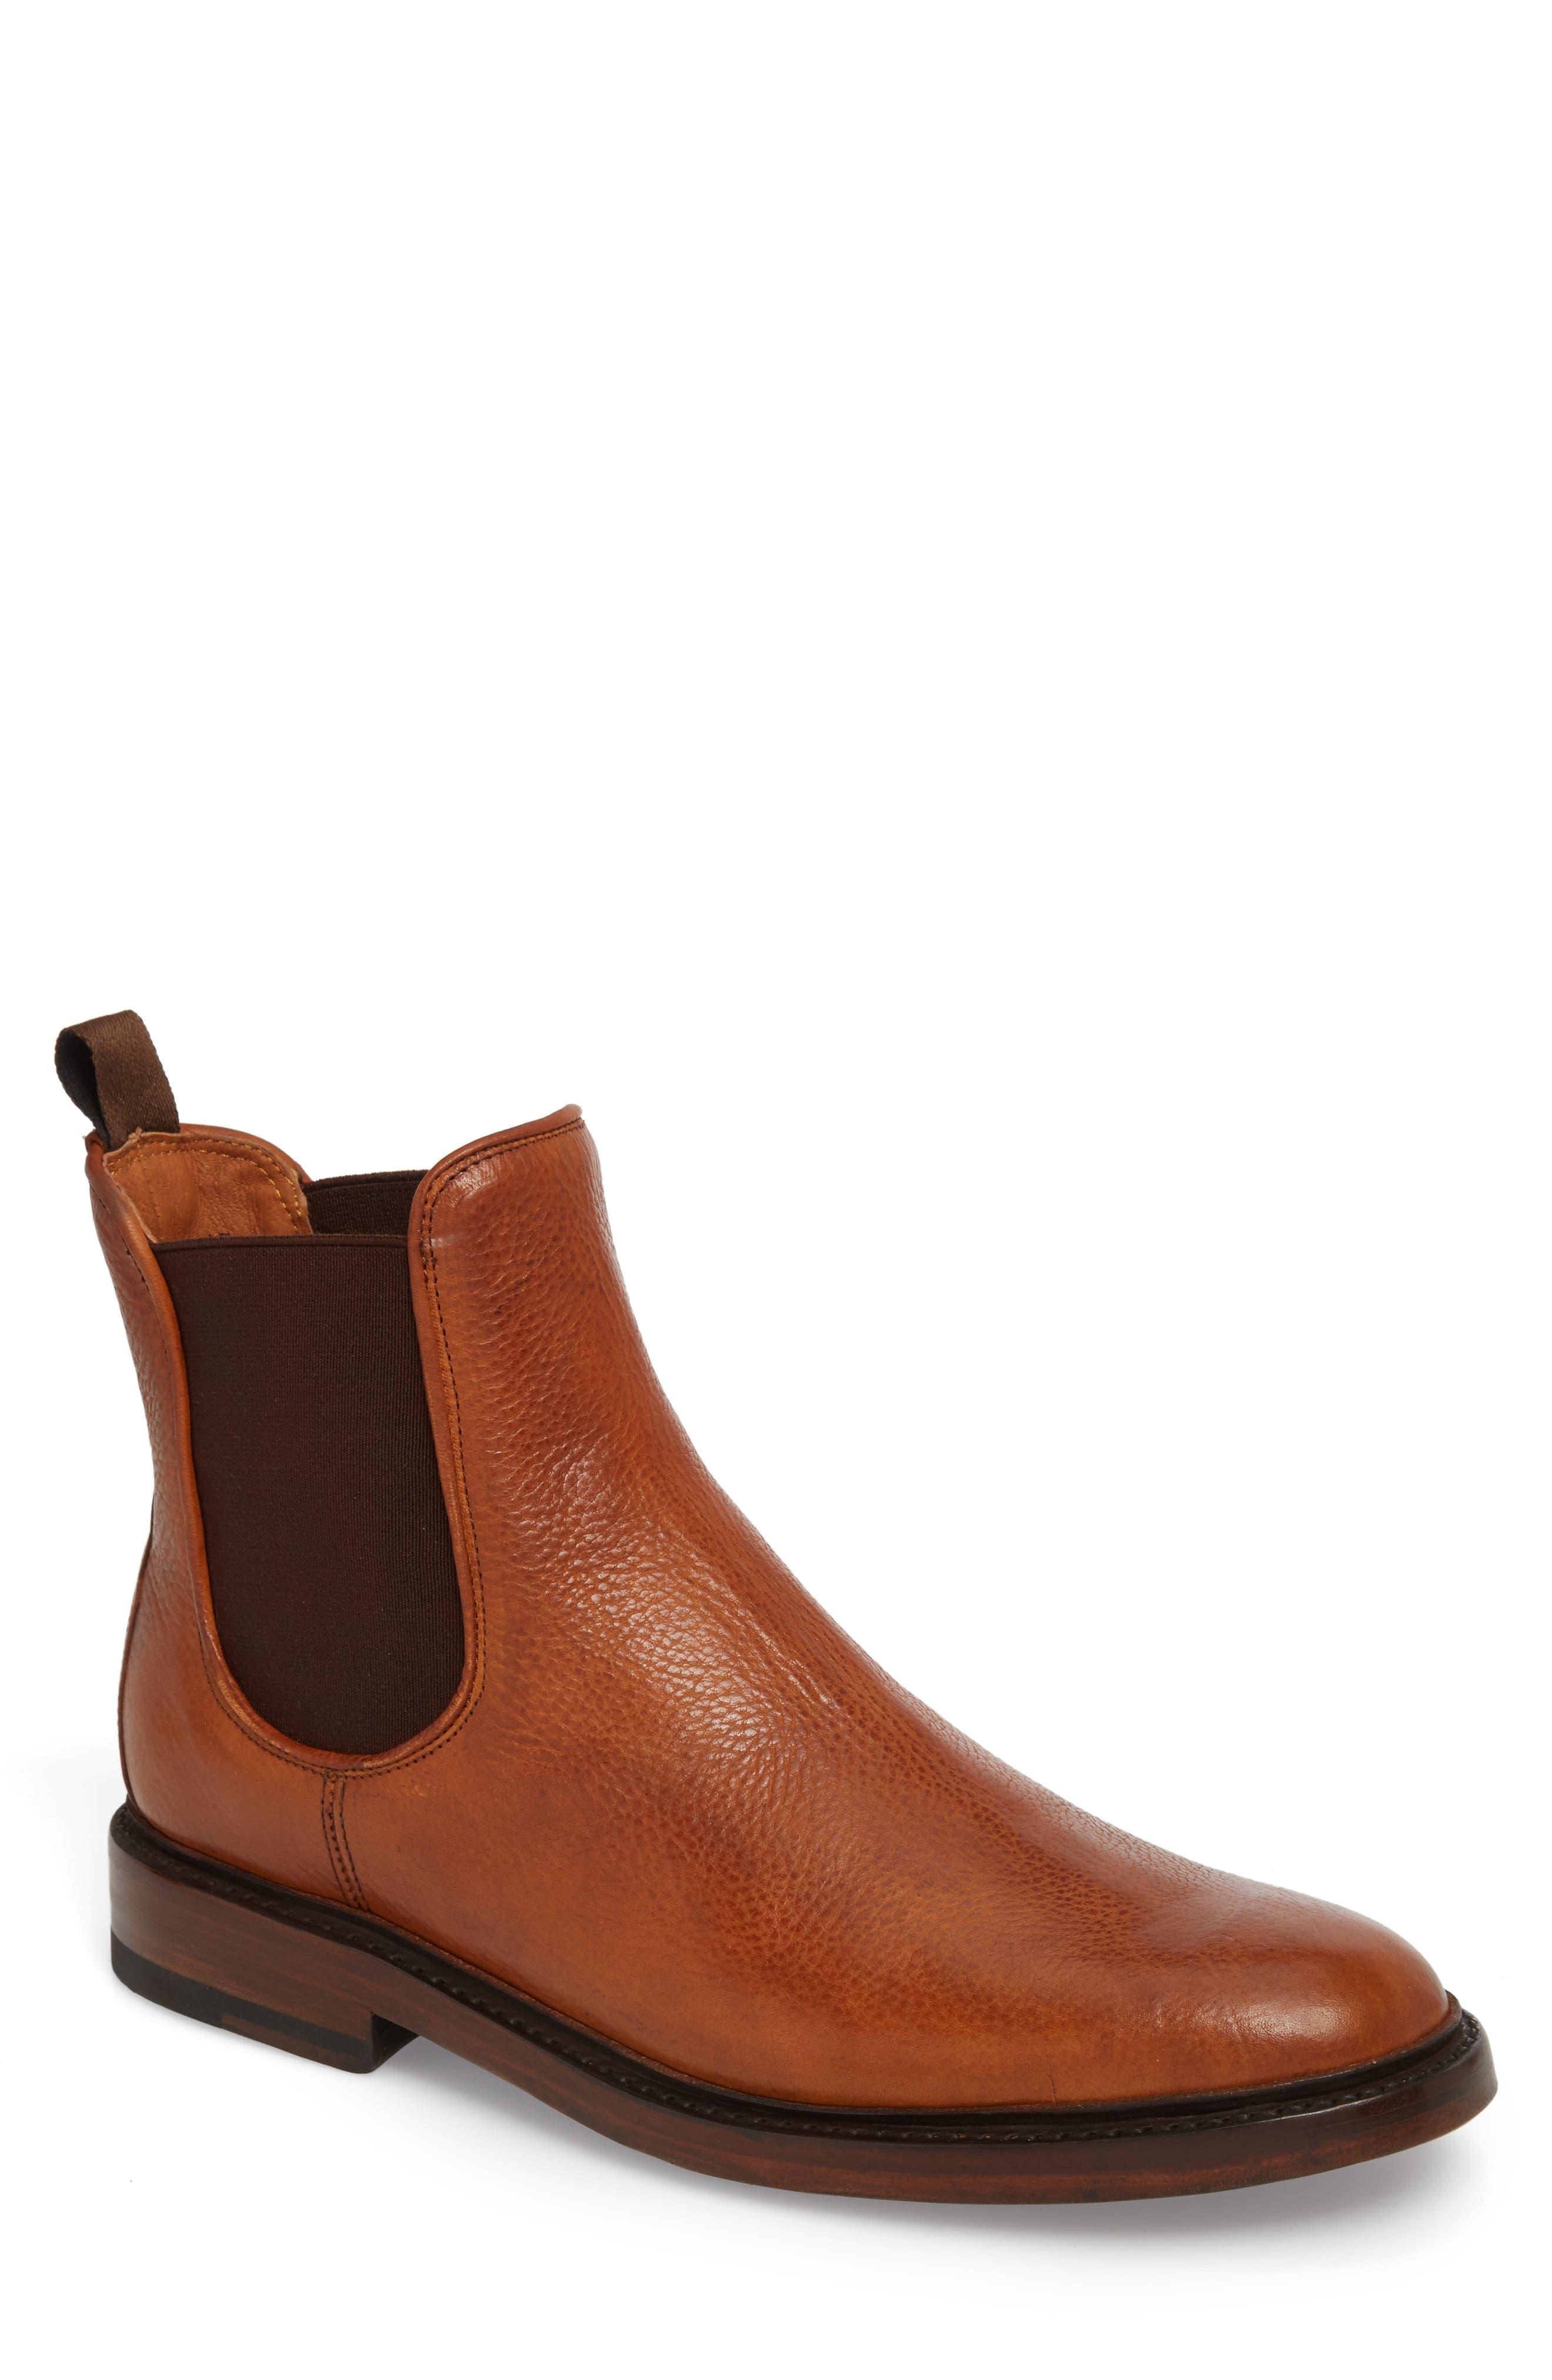 Jones Chelsea Boot,                         Main,                         color, Caramel Leather